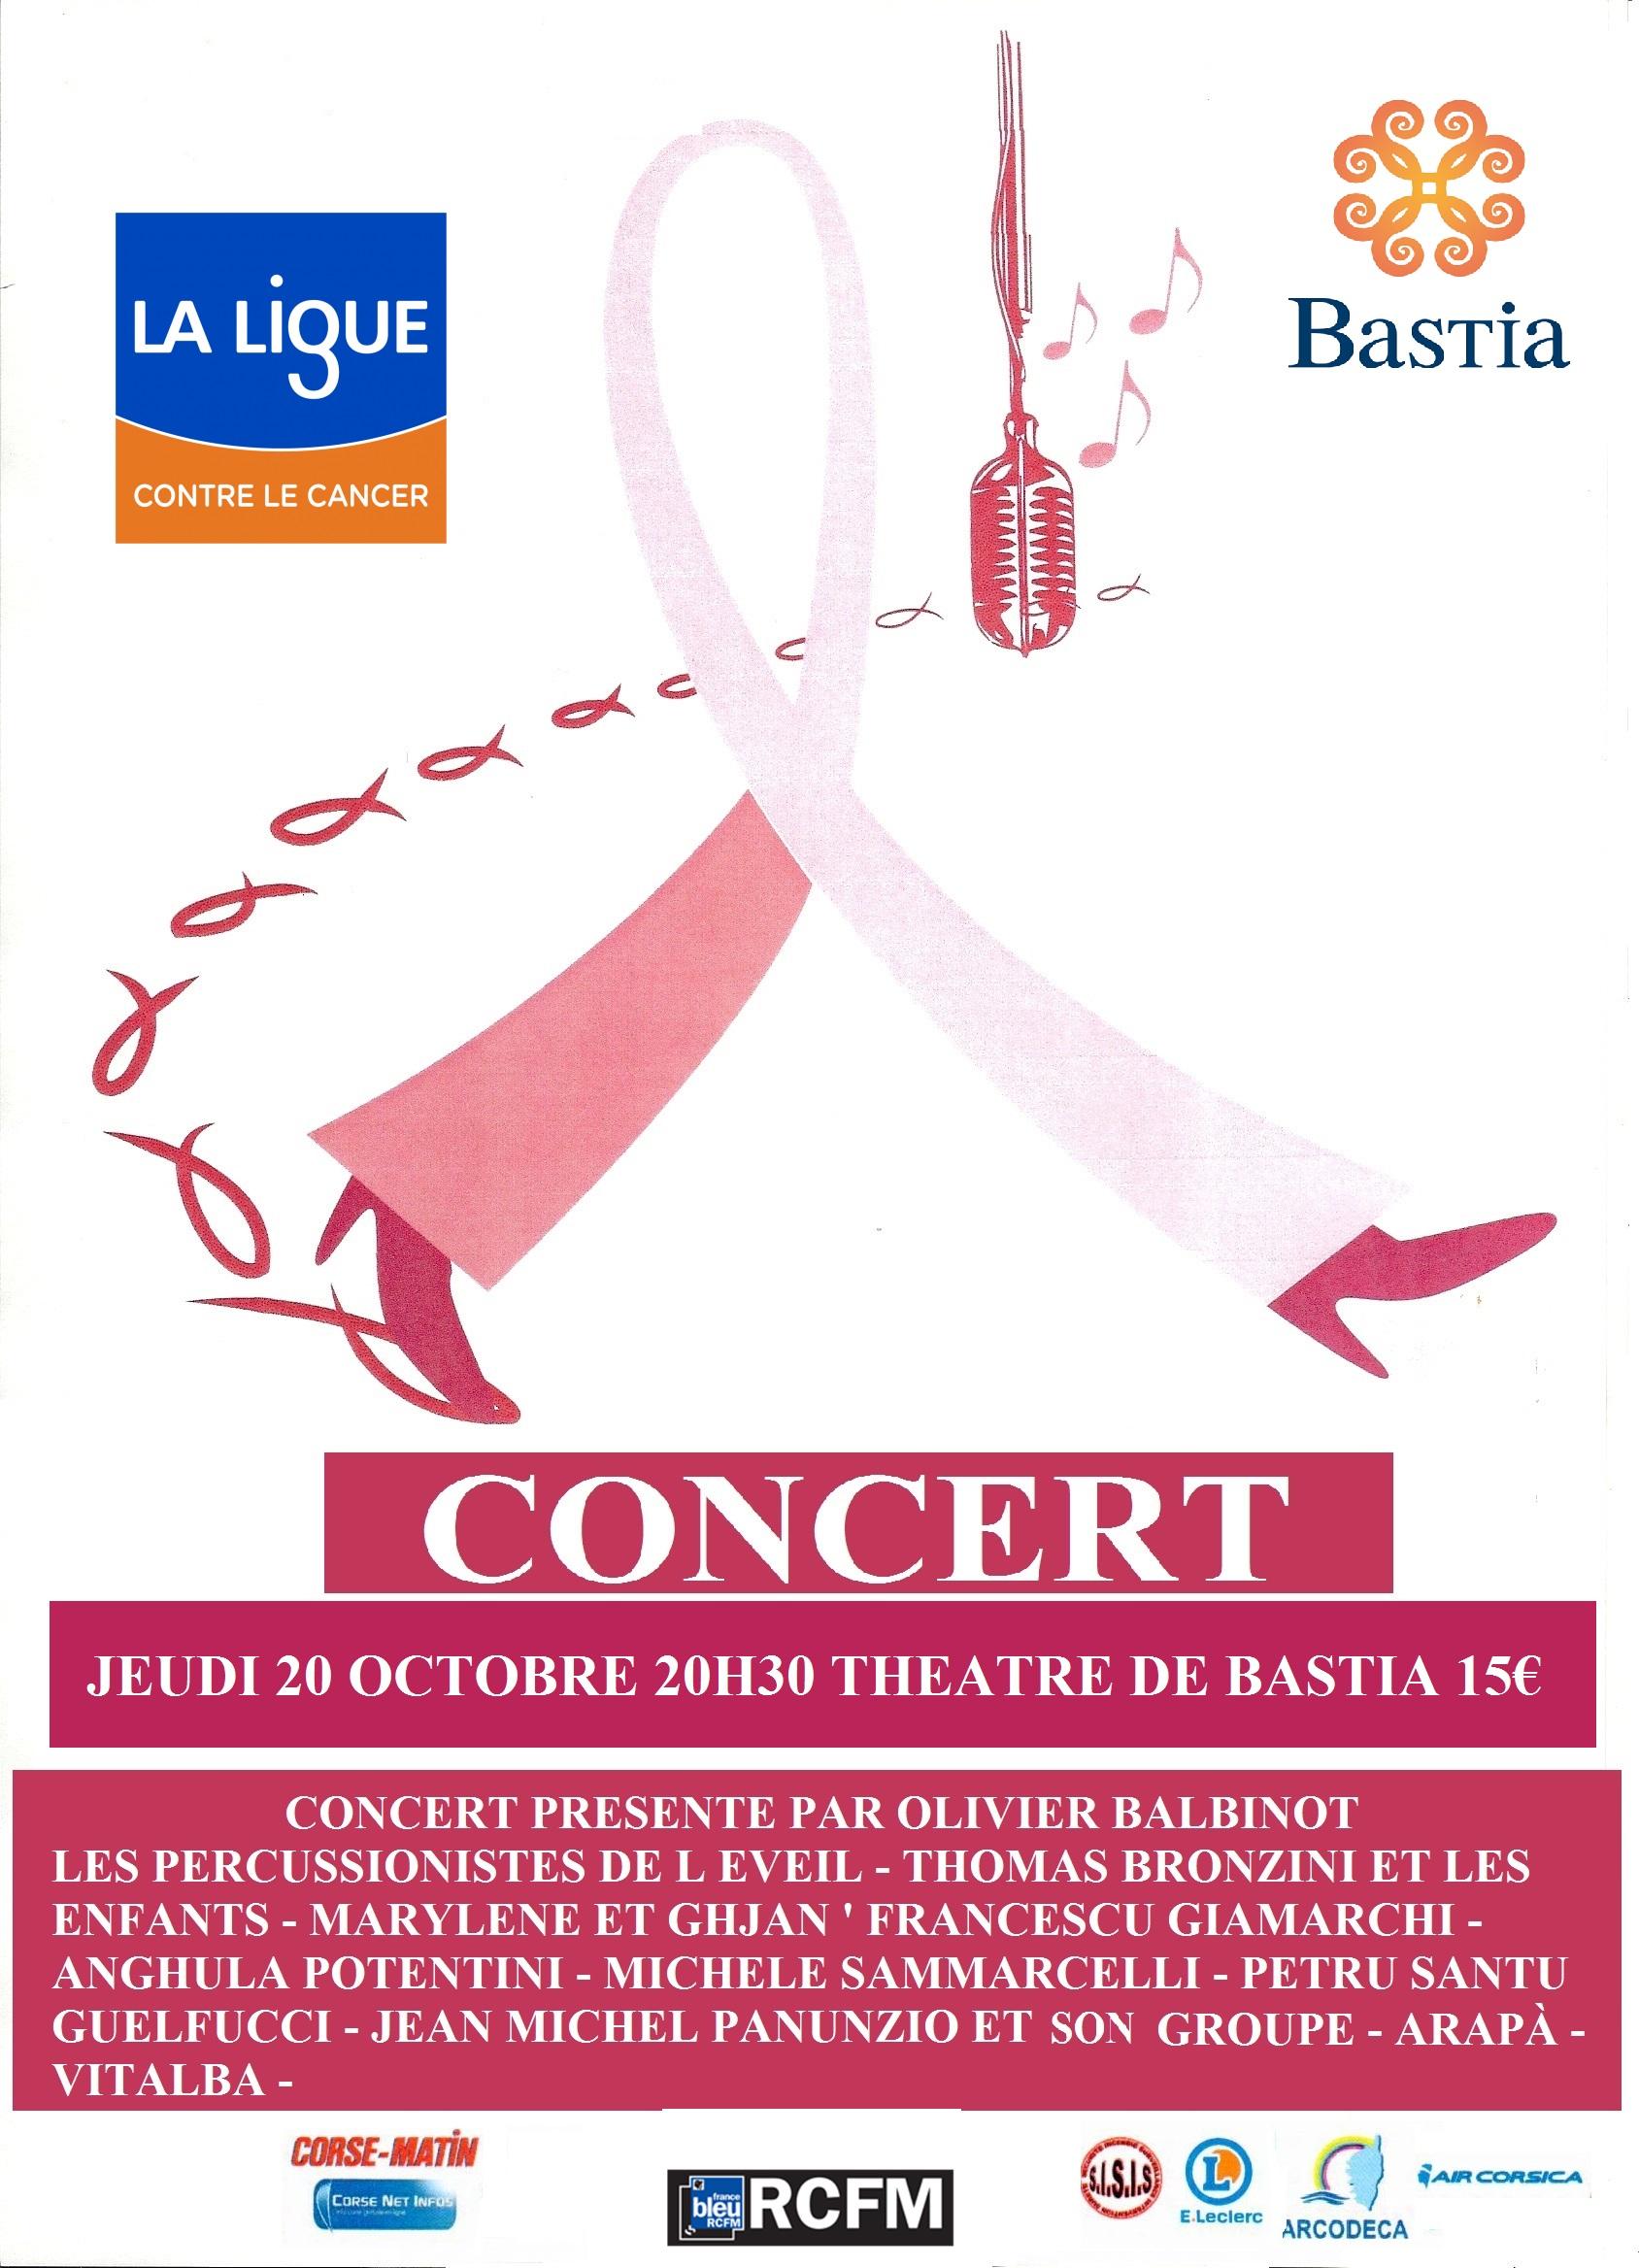 Bastia : Les artistes corses s'engagent contre le cancer